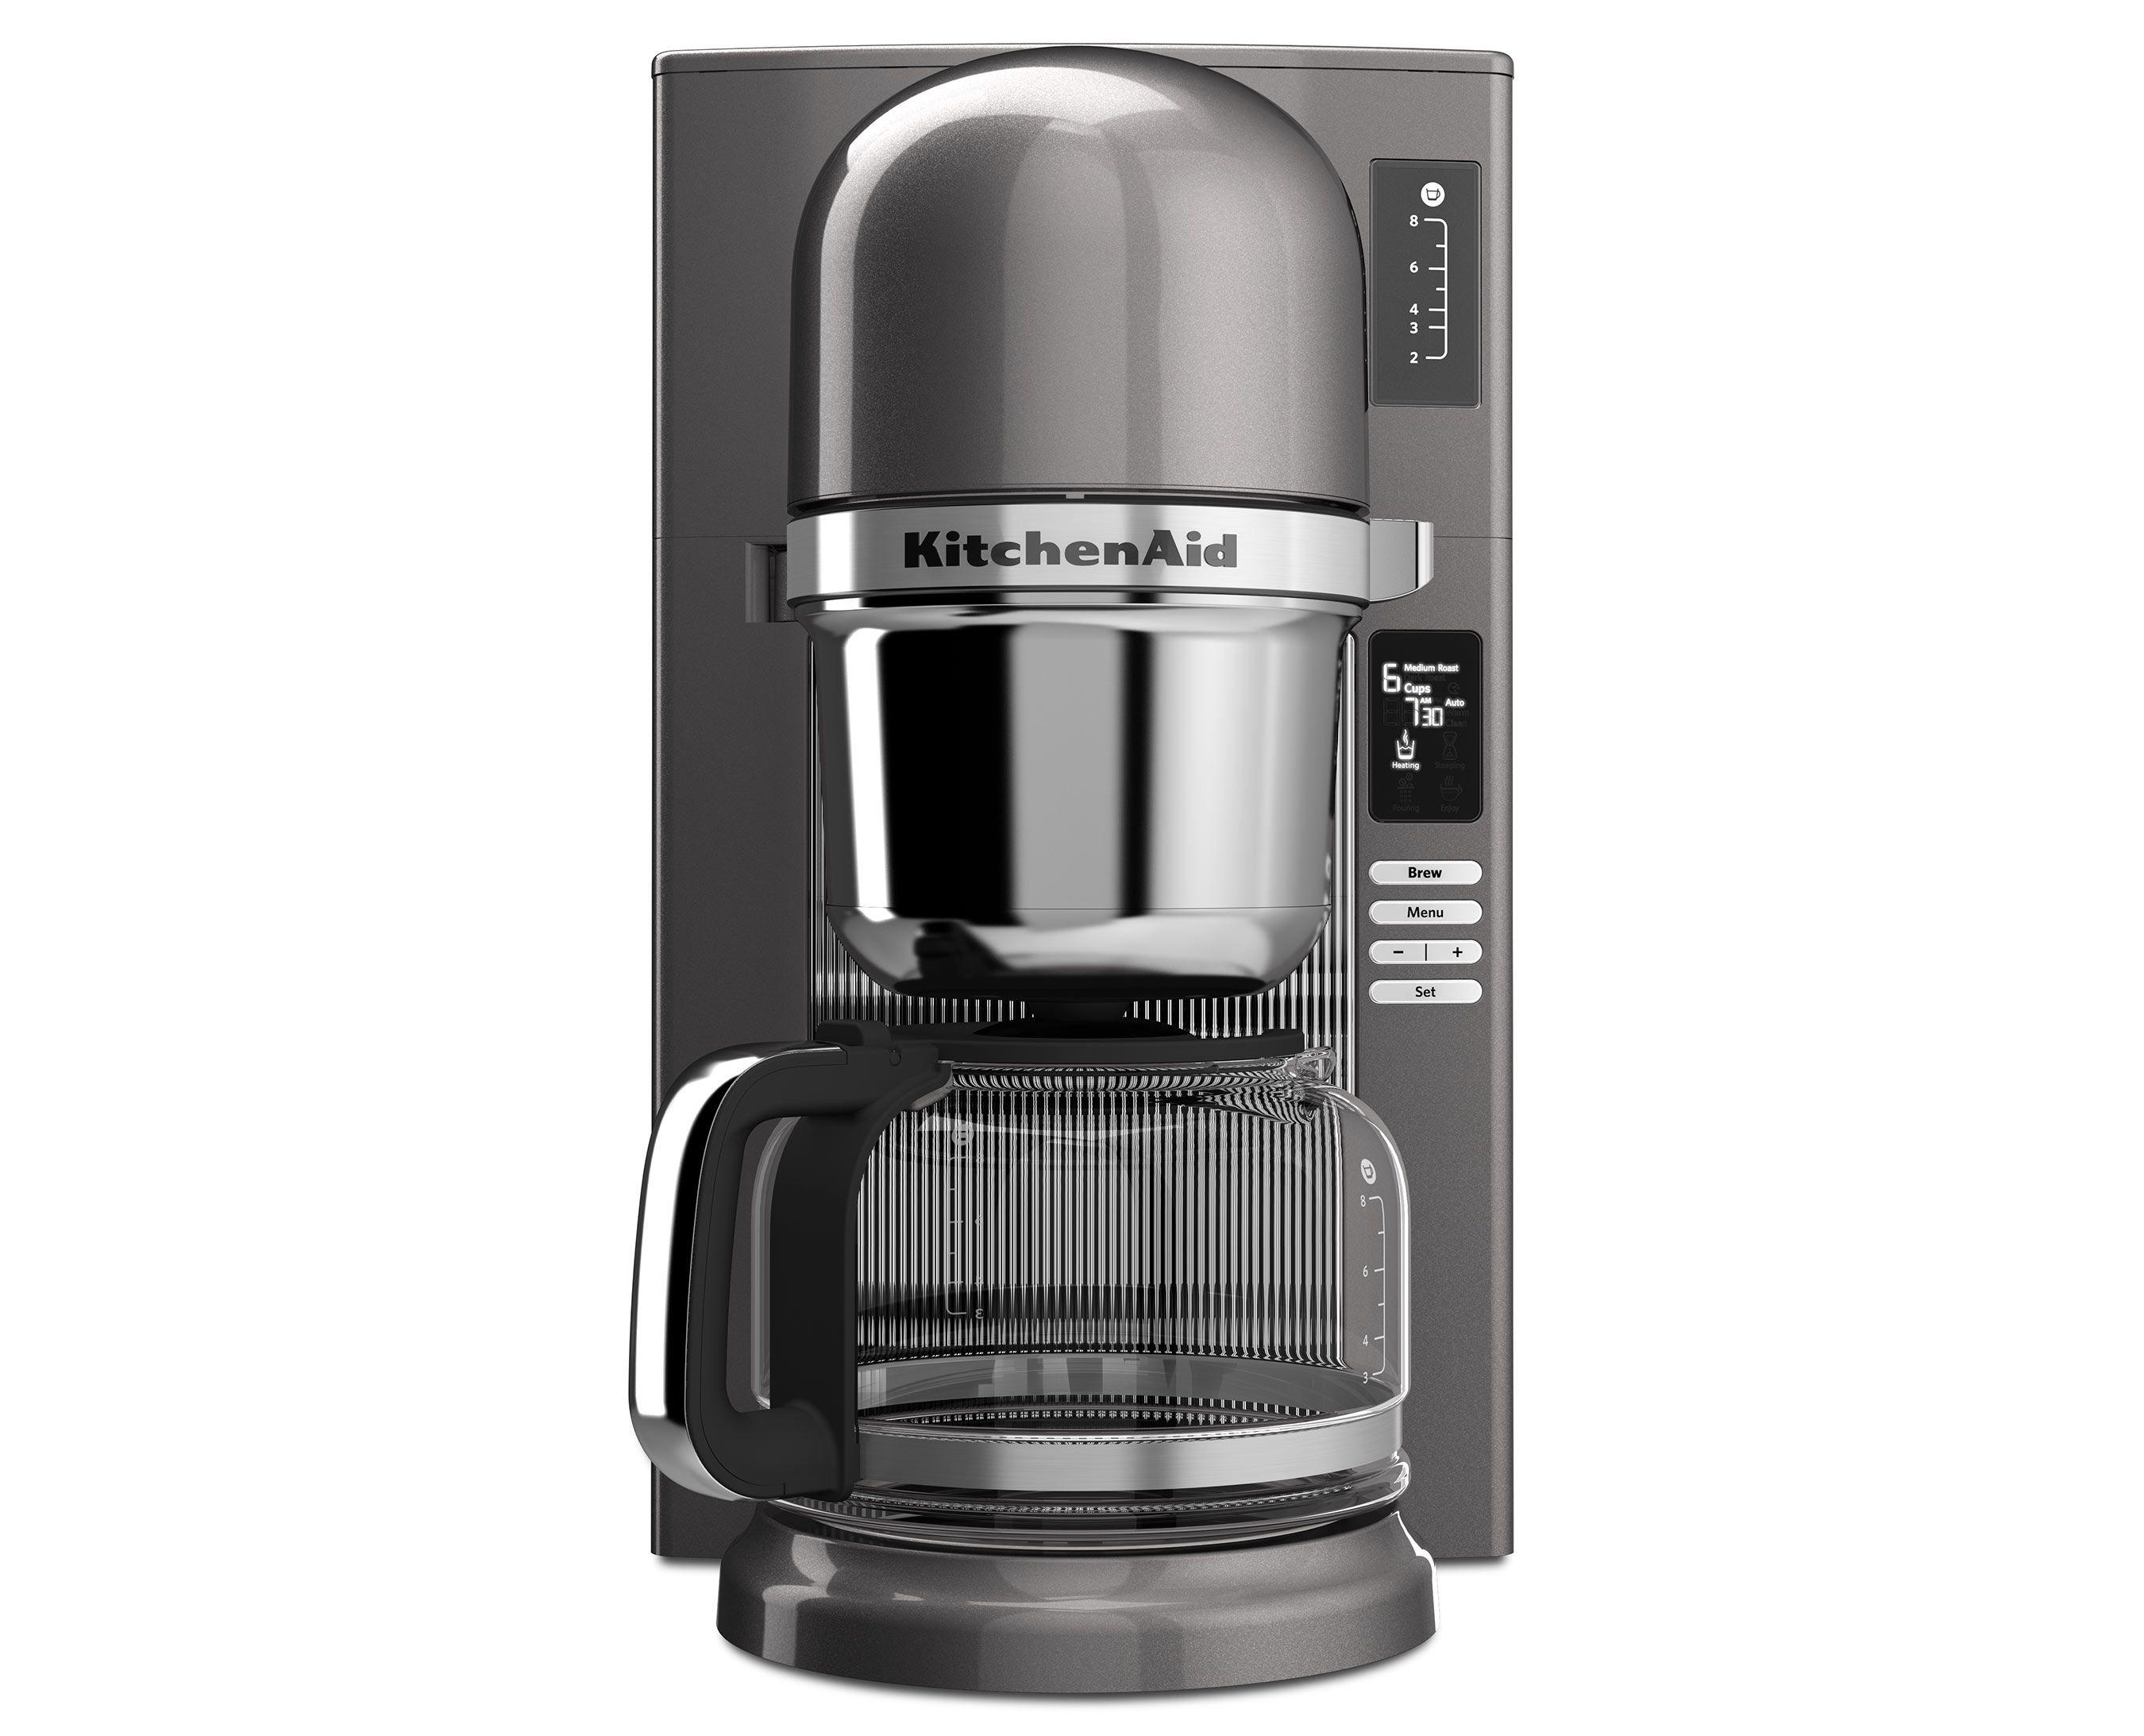 Kitchenaid craft coffee line brings the